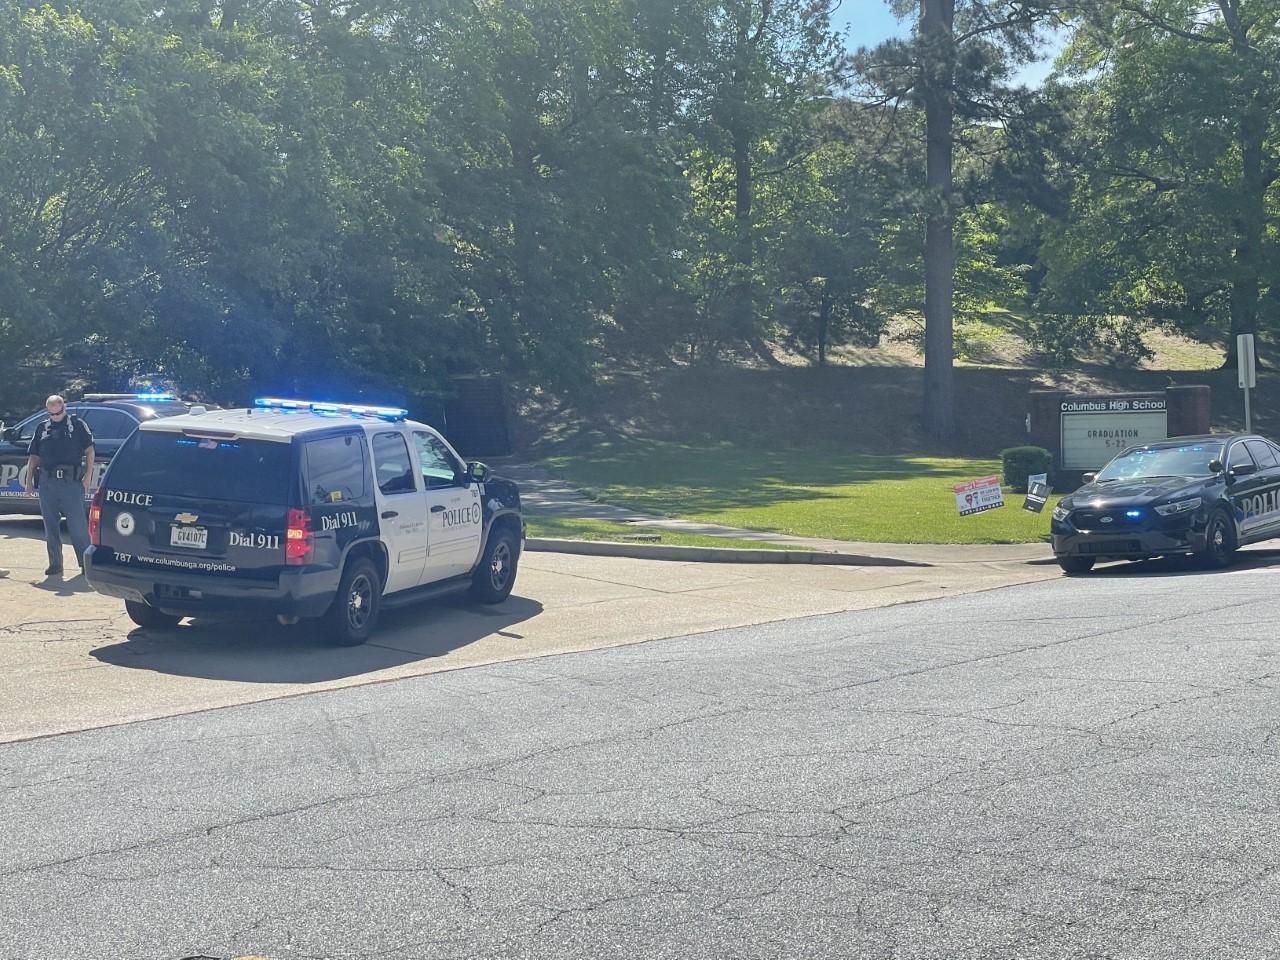 Columbus High School on lockdown